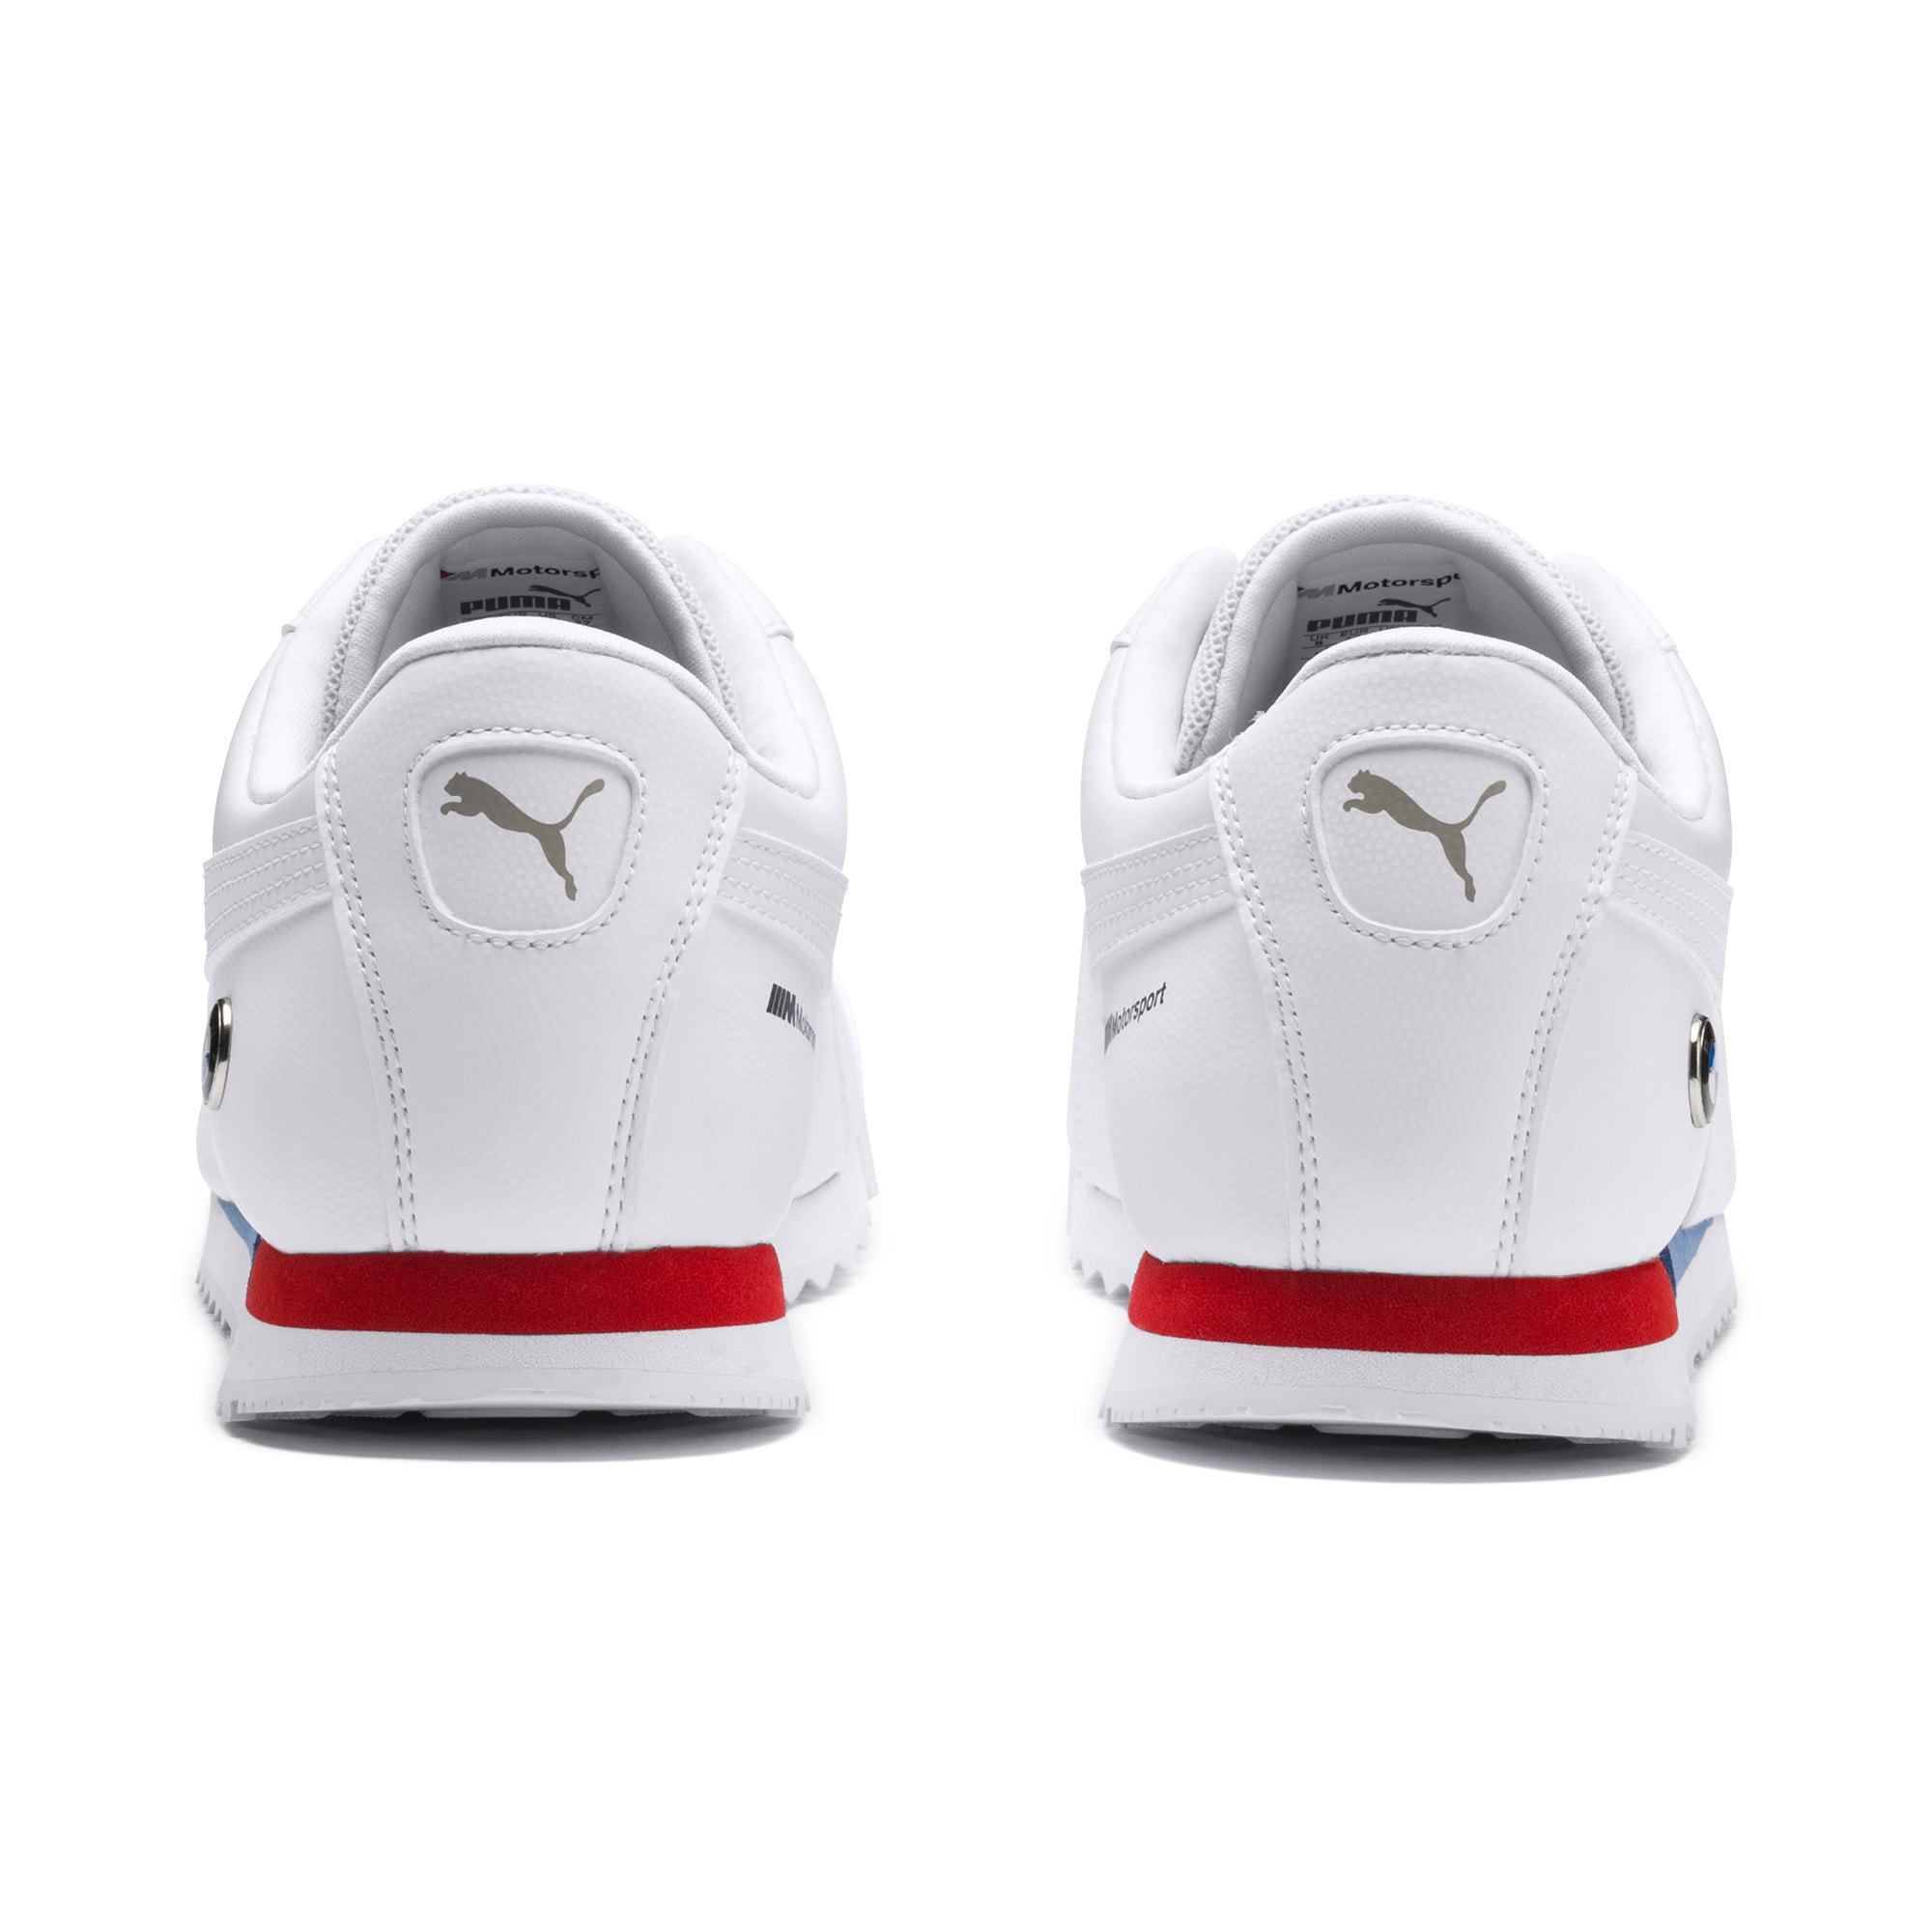 Thumbnail 3 of BMW MMS Roma sneakers voor heren, Puma White-Puma White, medium